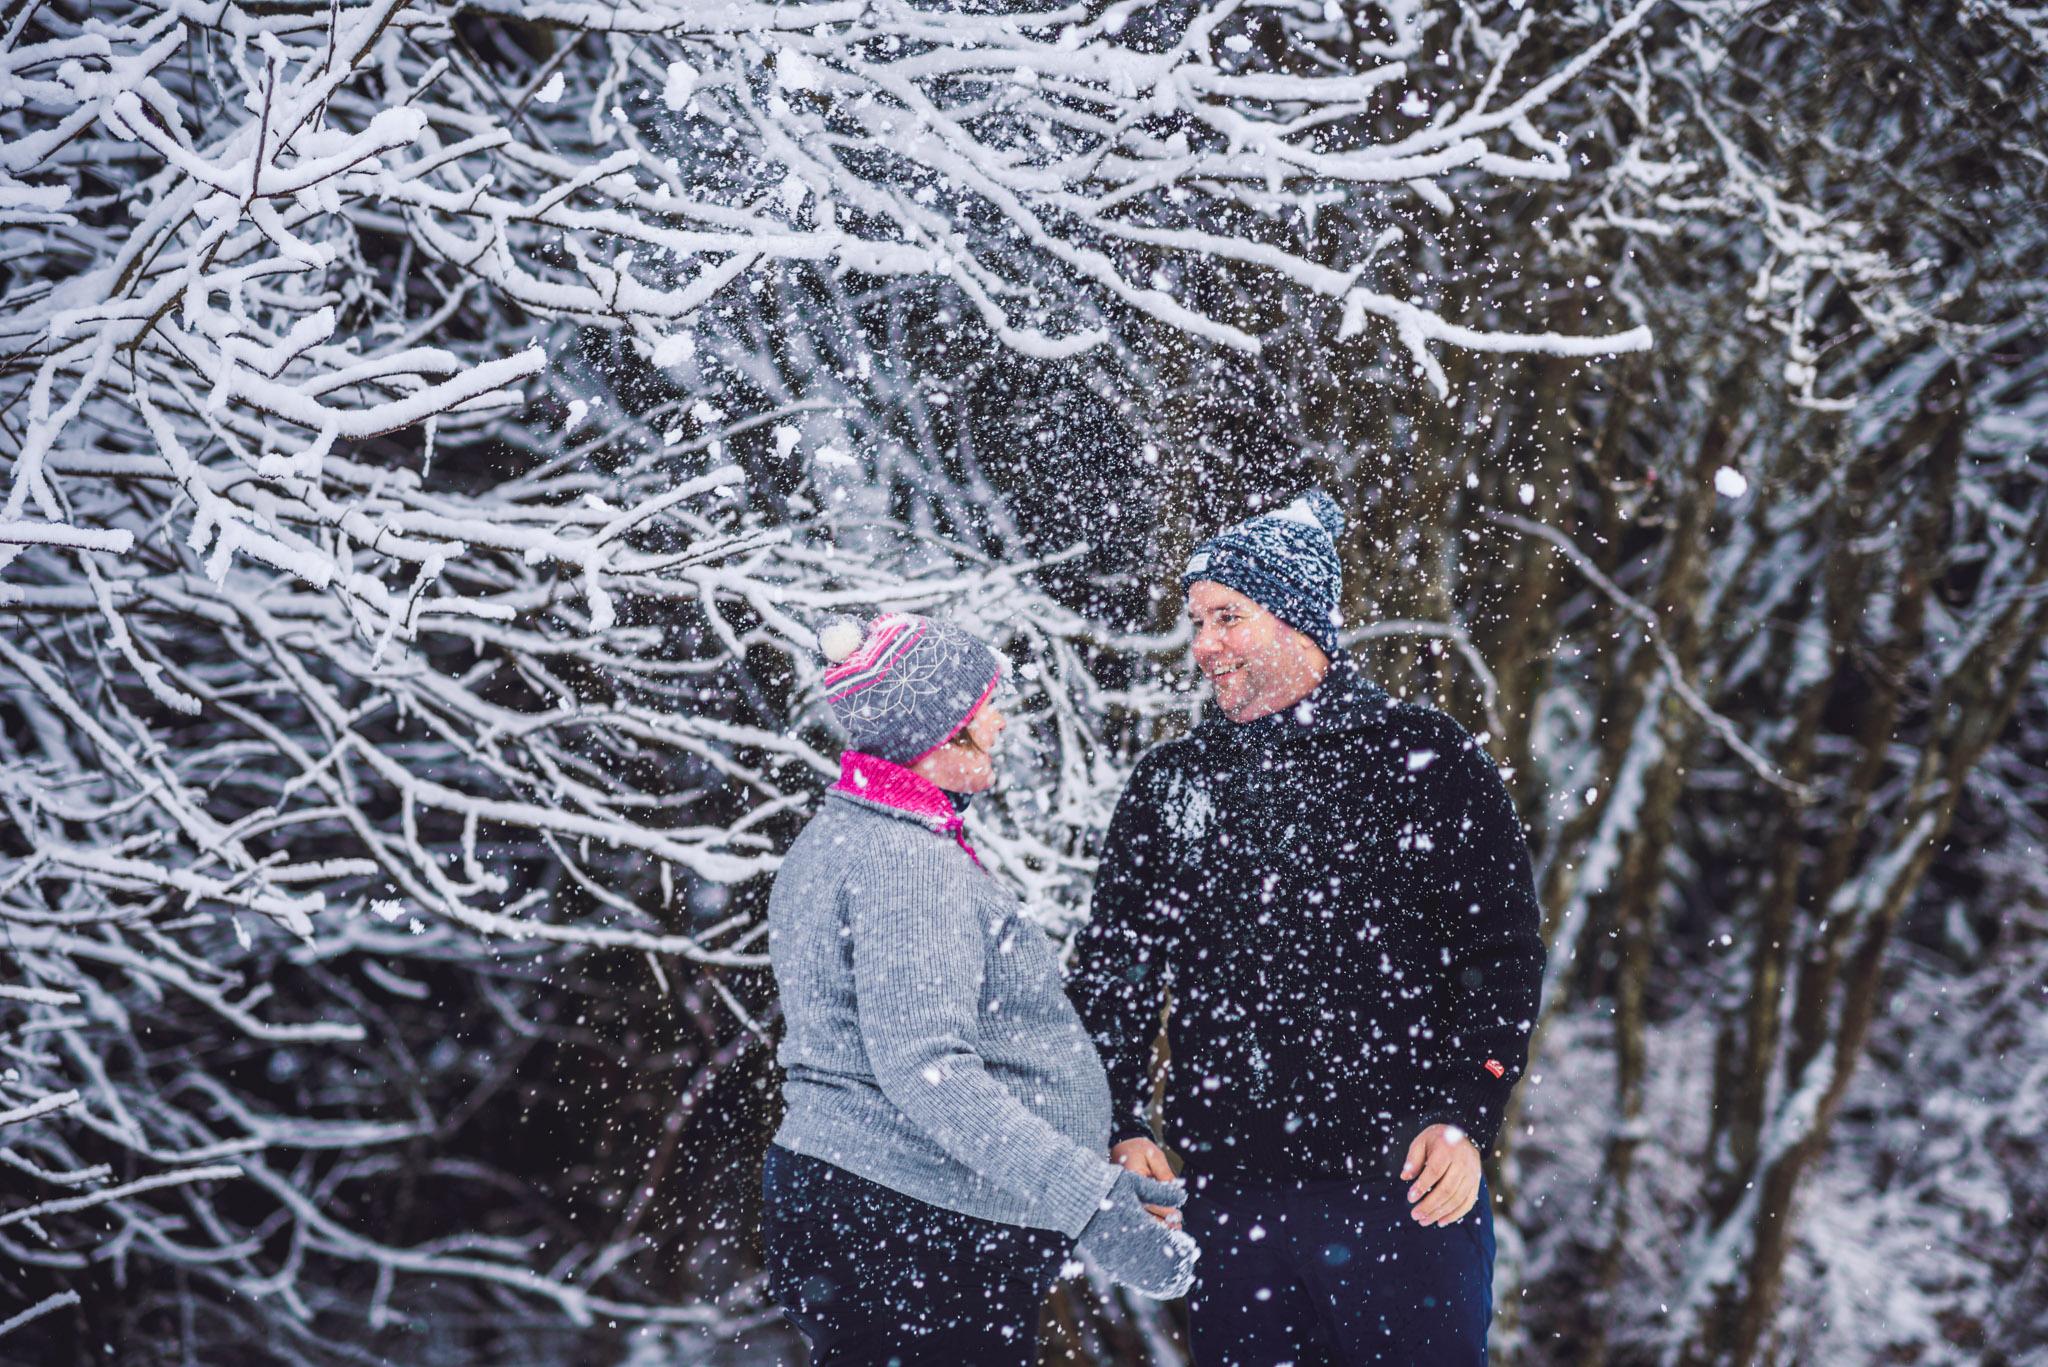 Bryllupsfotograf- stavanger-forlovet-vinterbilder-eirik-halvorsen-14.jpg